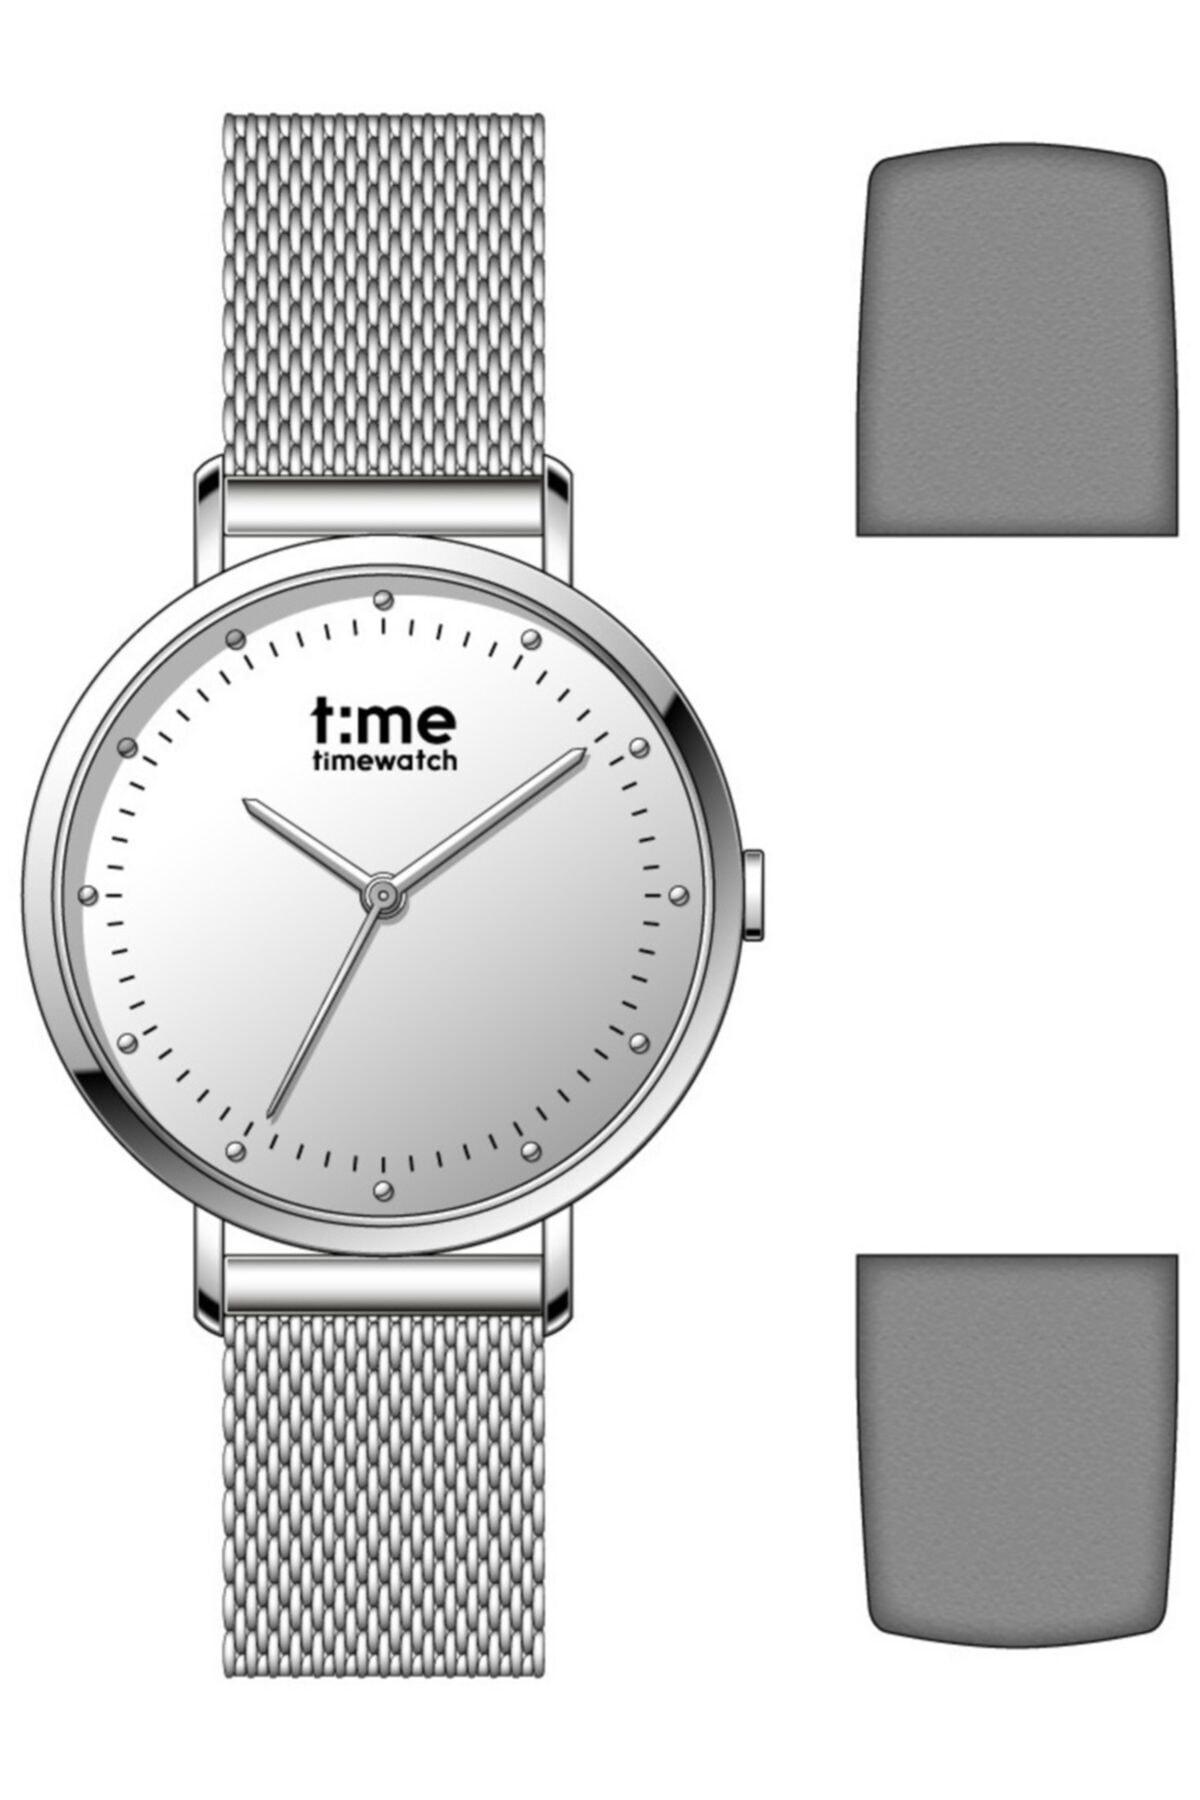 Timewatch Time Watch Tw.131.4 Csc Kadın Kol Saati Deri Kordon Hediyeli 1